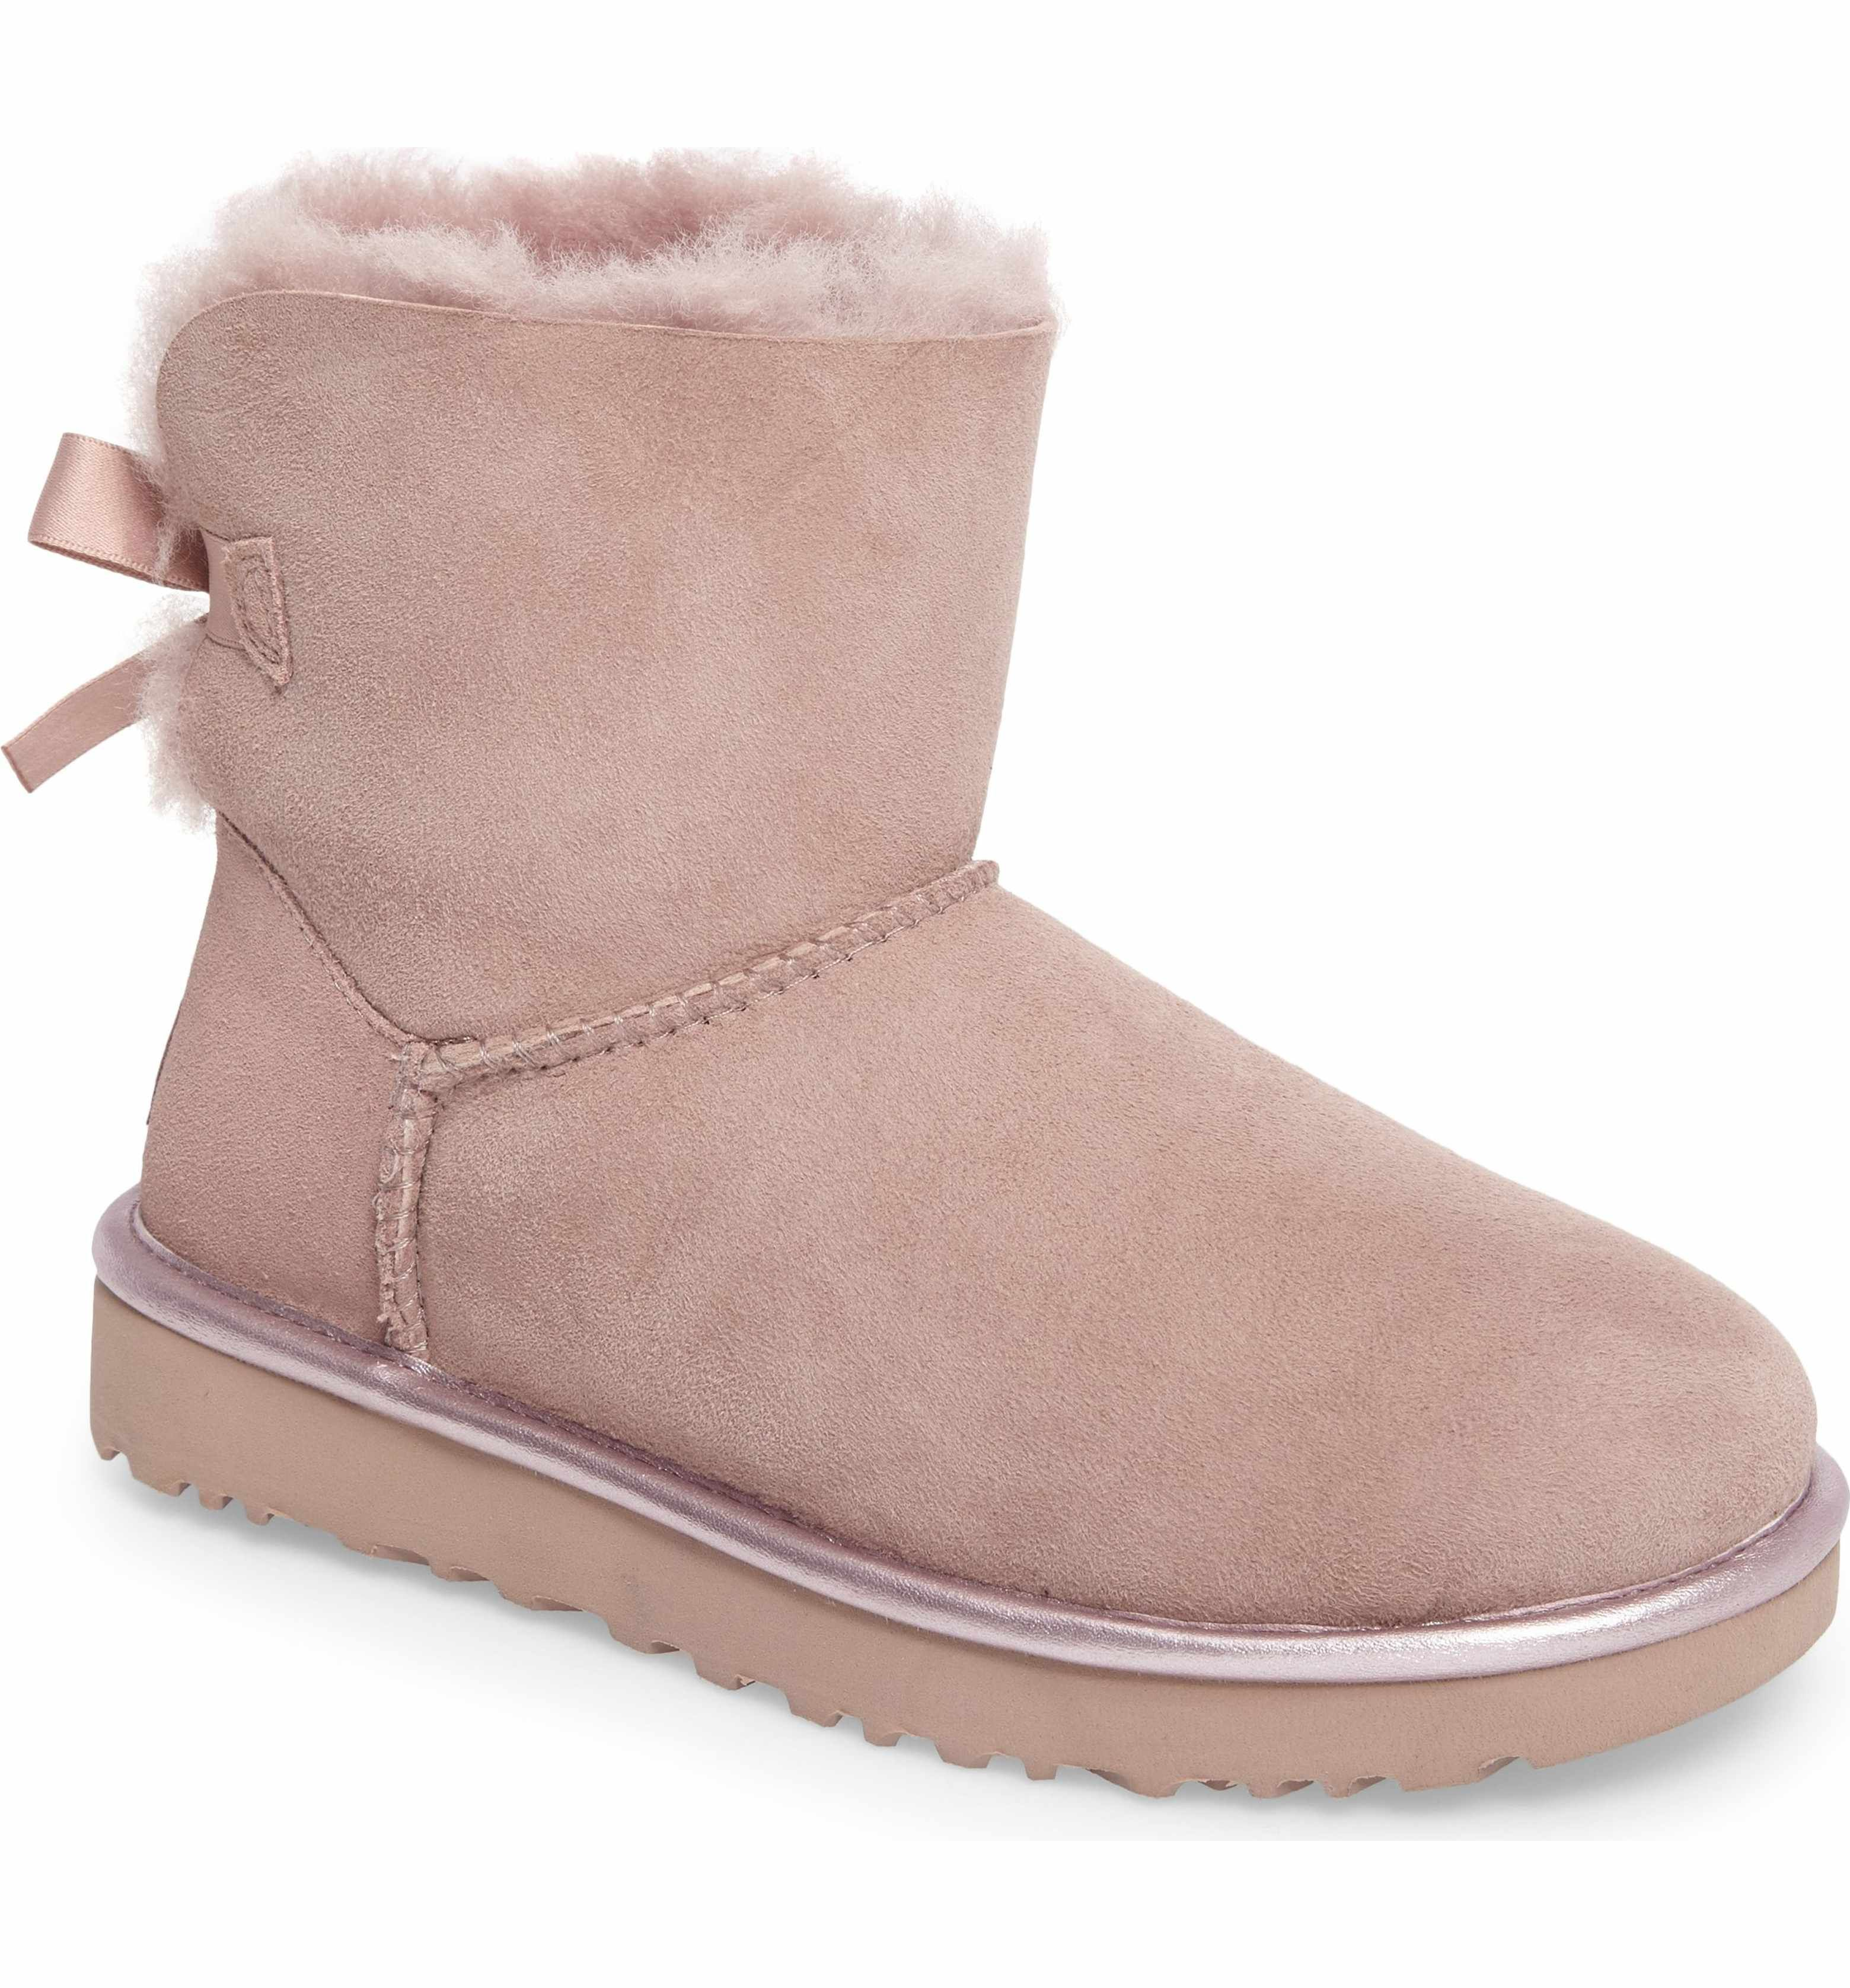 89e20a9cf61 Main Image - UGG® Mini Bailey Bow II Metallic Boot (Women)